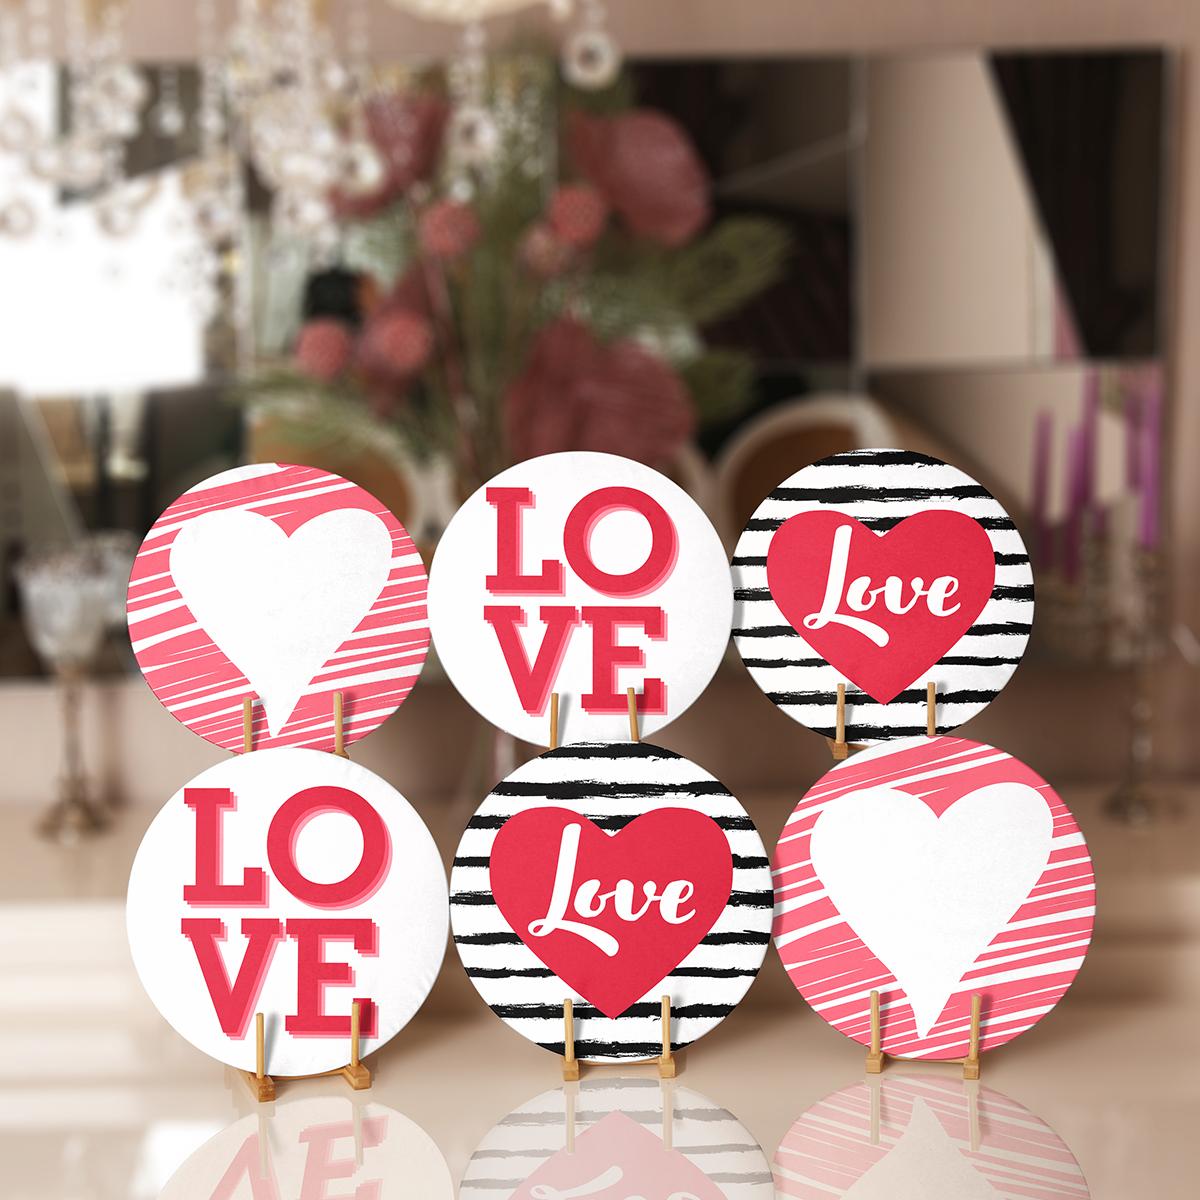 6'lı Love Yazılı Özel Tasarım Sevgili Temalı Servis Altlığı & Supla Realhomes